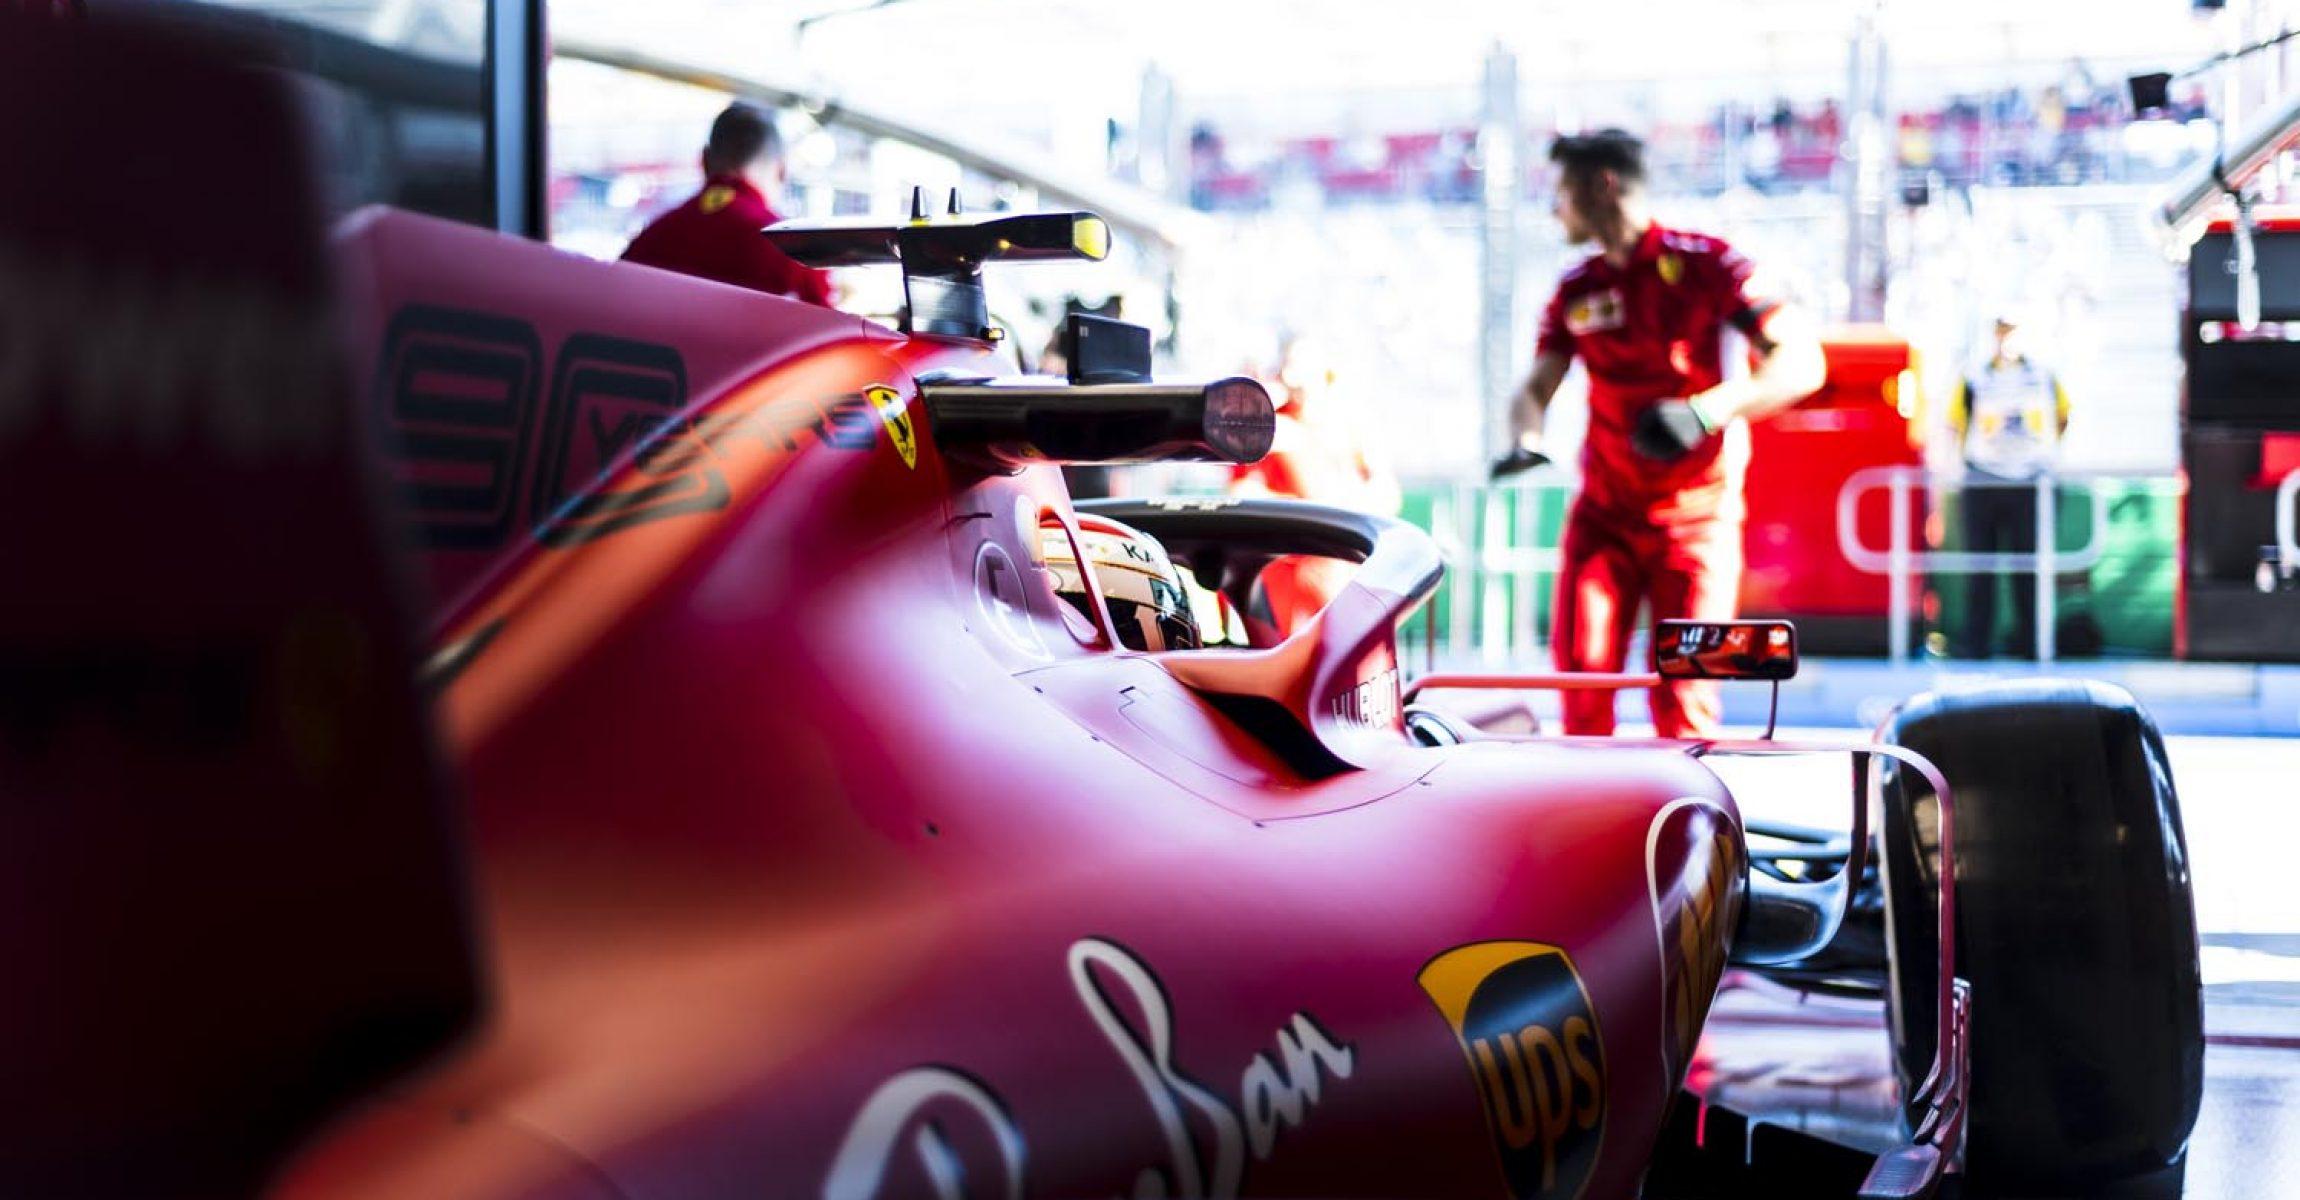 Ferrari, Melbourne, Charles Leclerc